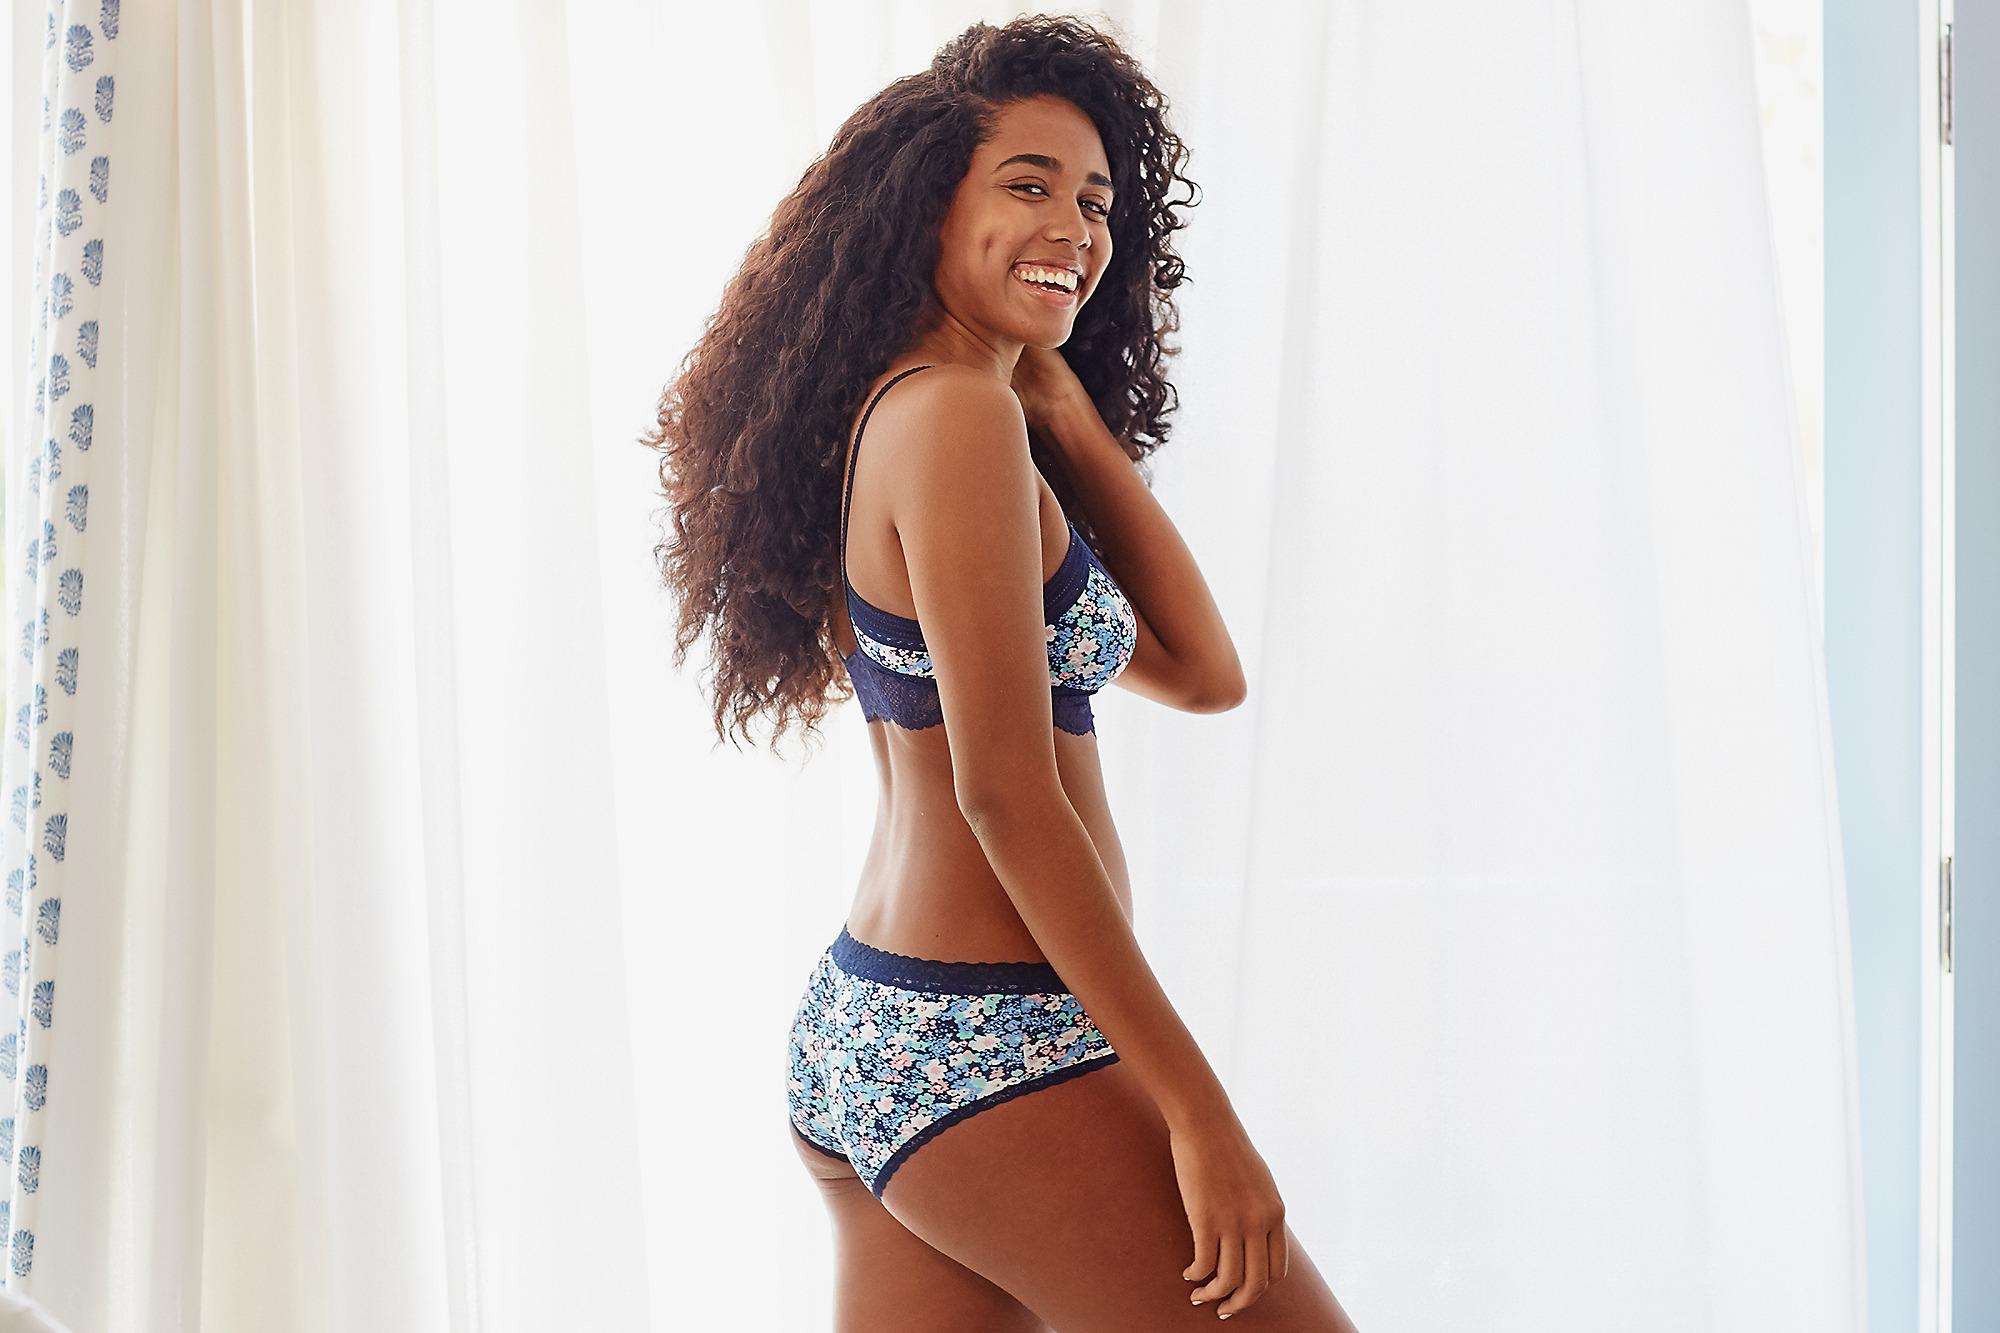 A model wearing Aerie underwear and bra